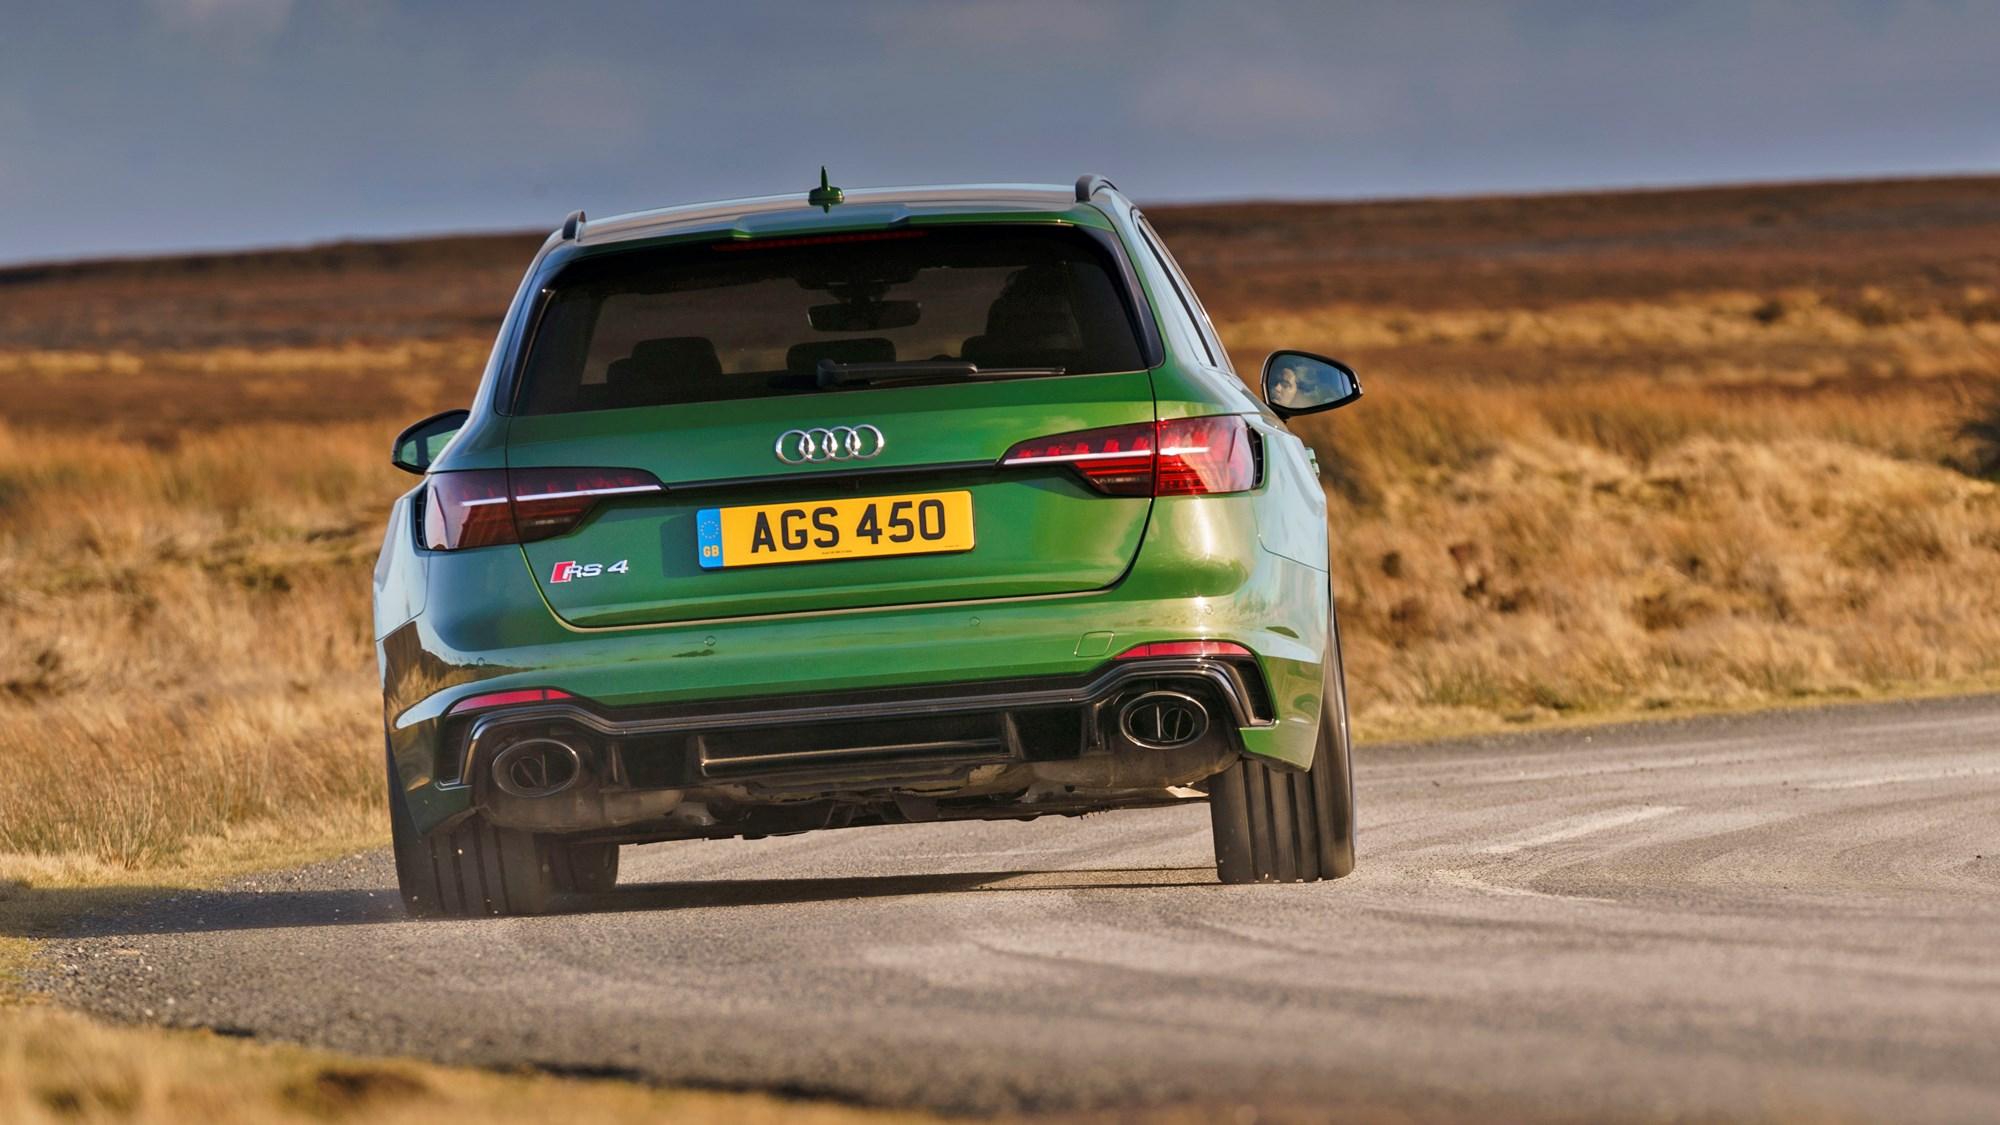 Green 2021 Audi RS4 Avant rear elevation driving